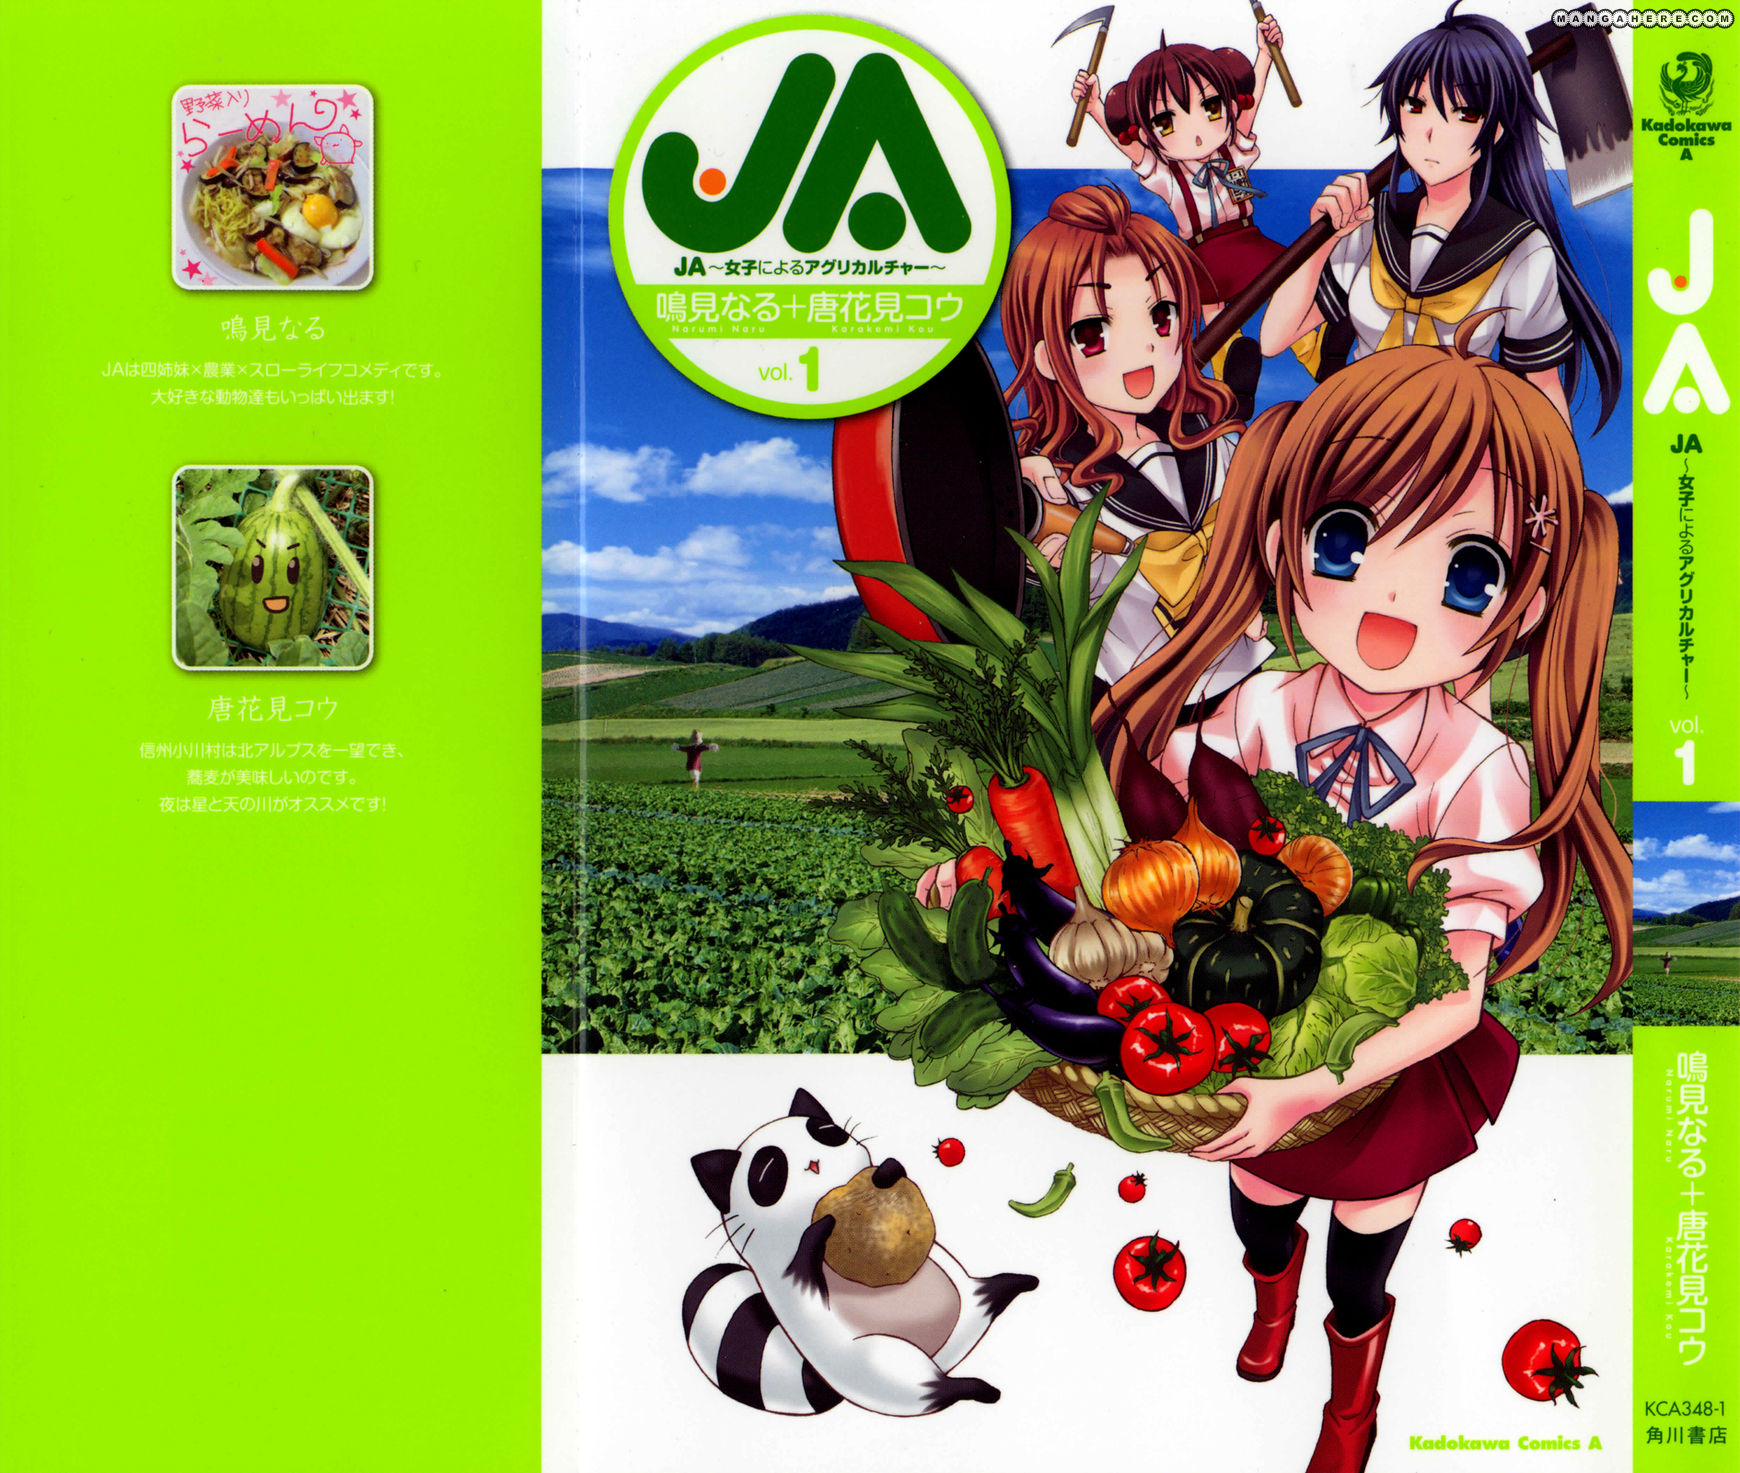 Ja - Joshi ni Yoru Agriculture 1 Page 1